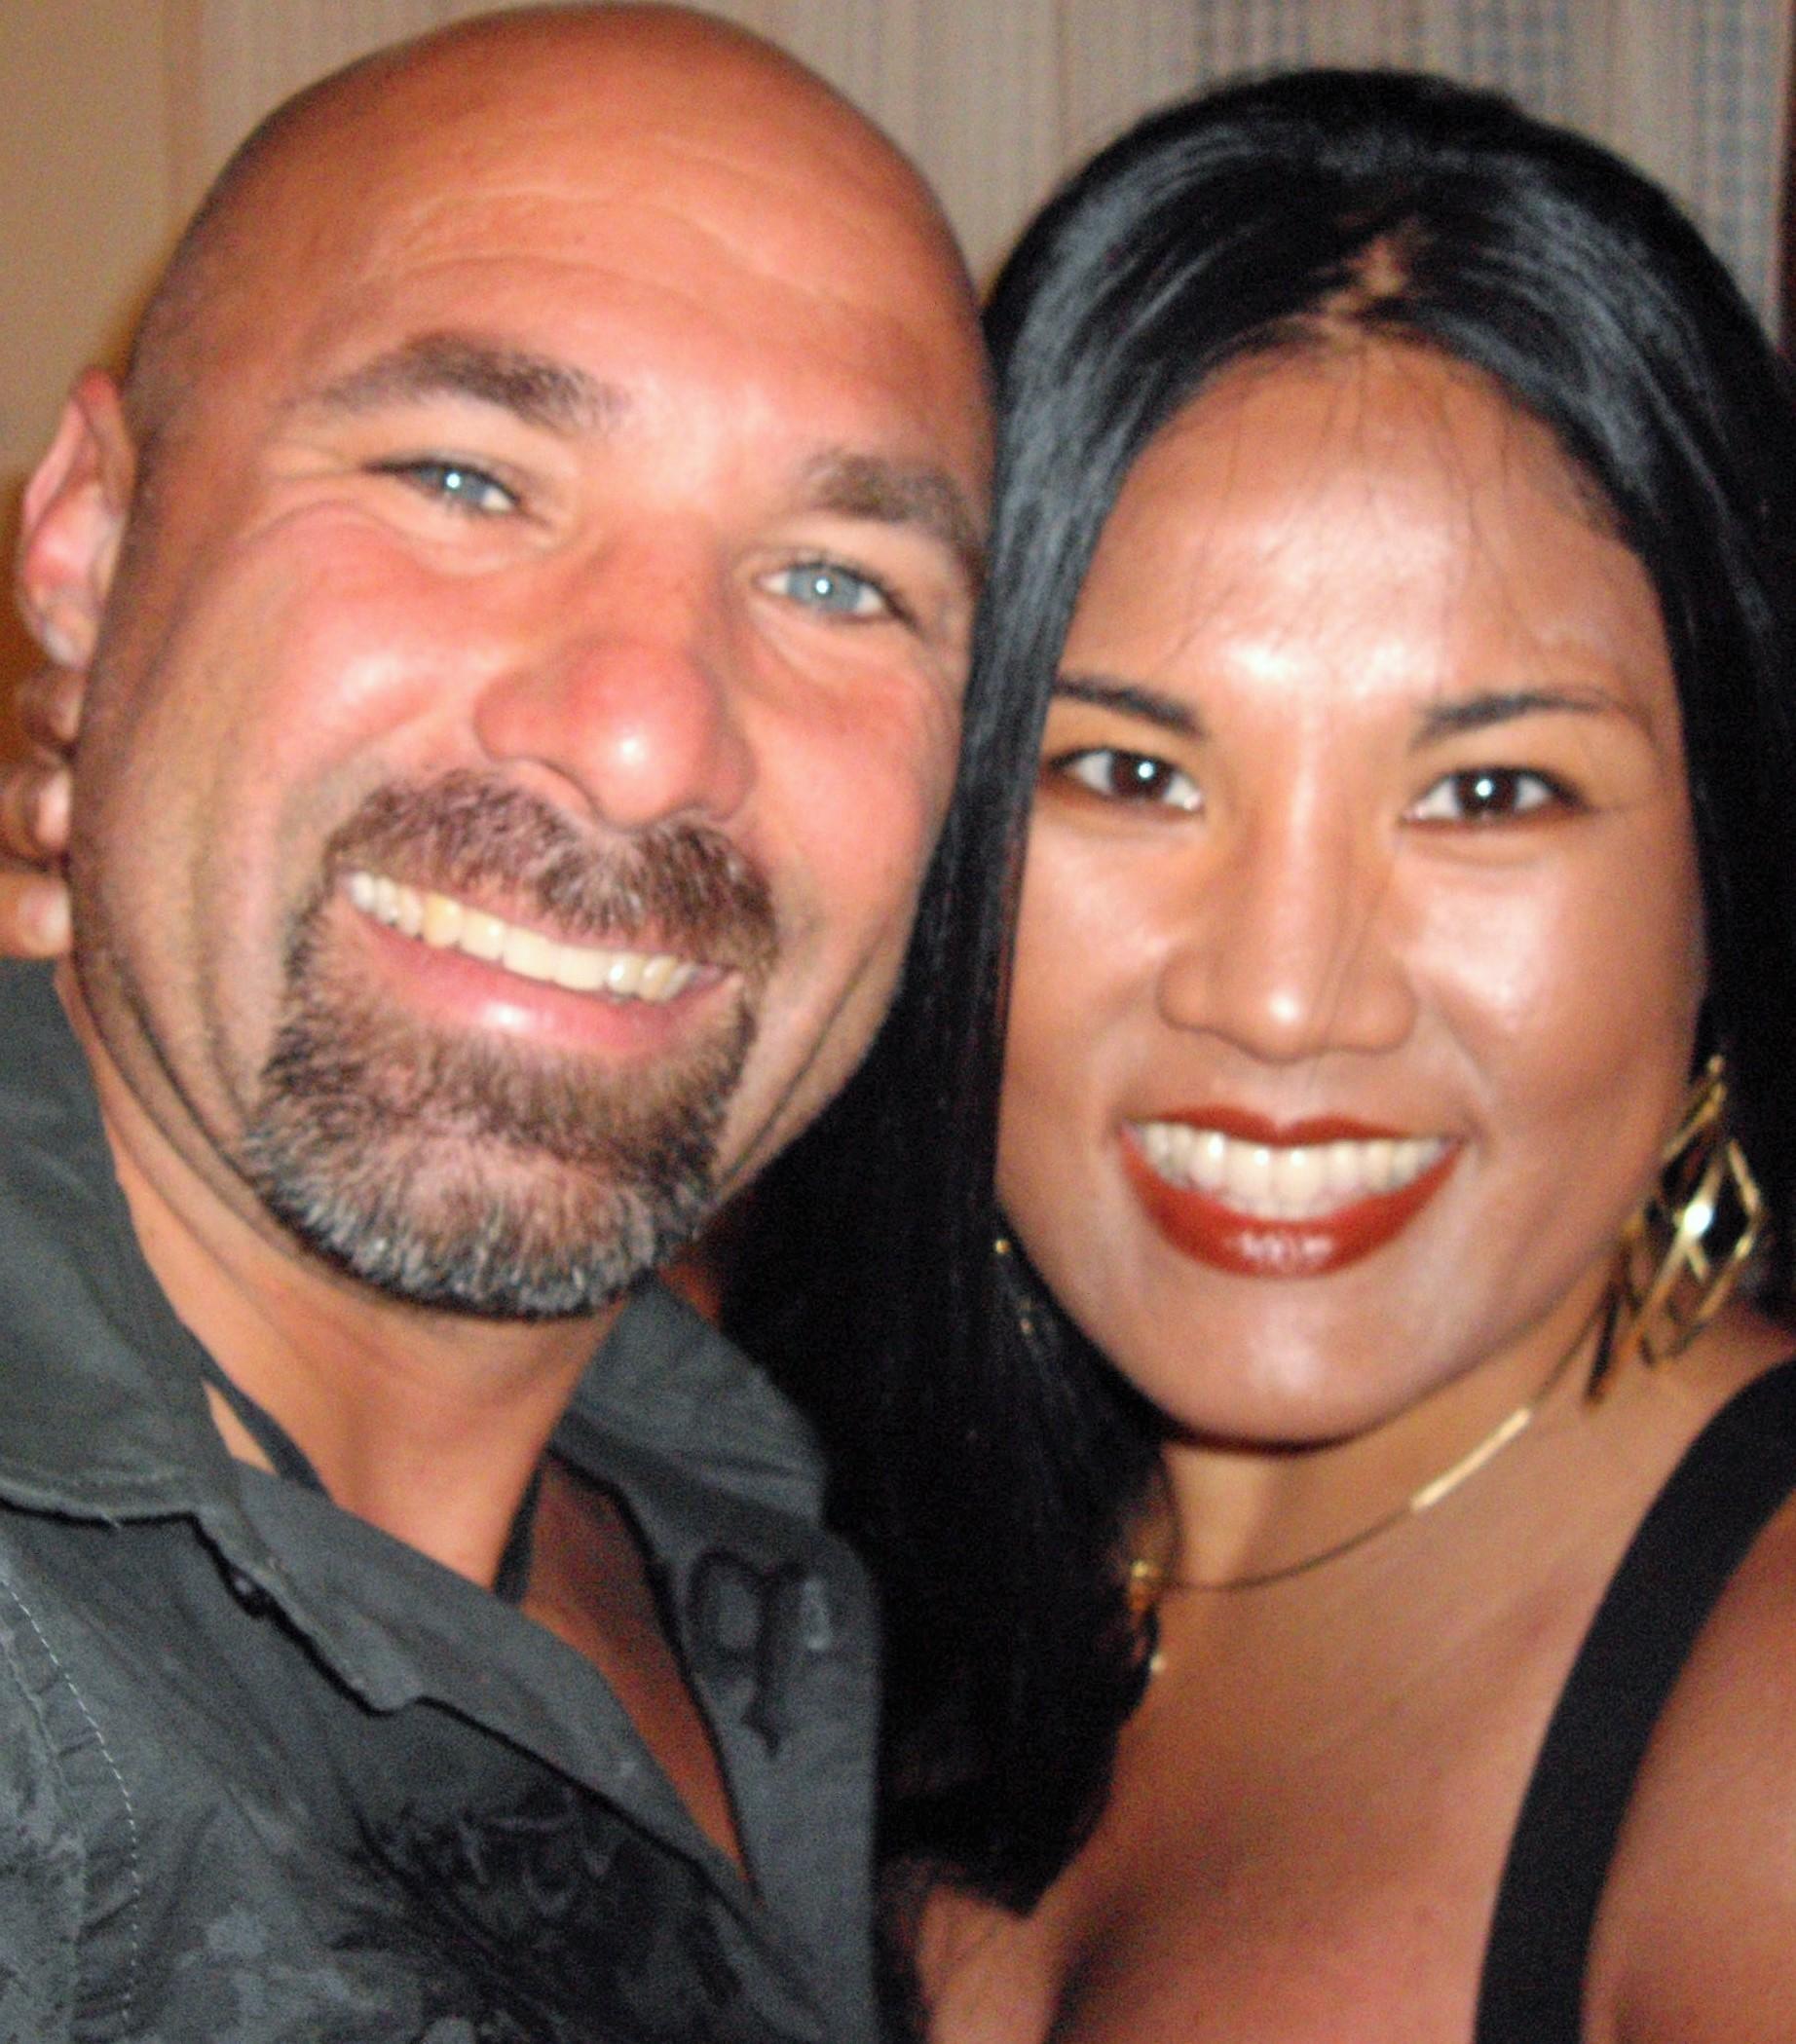 Bob and Kristina T.